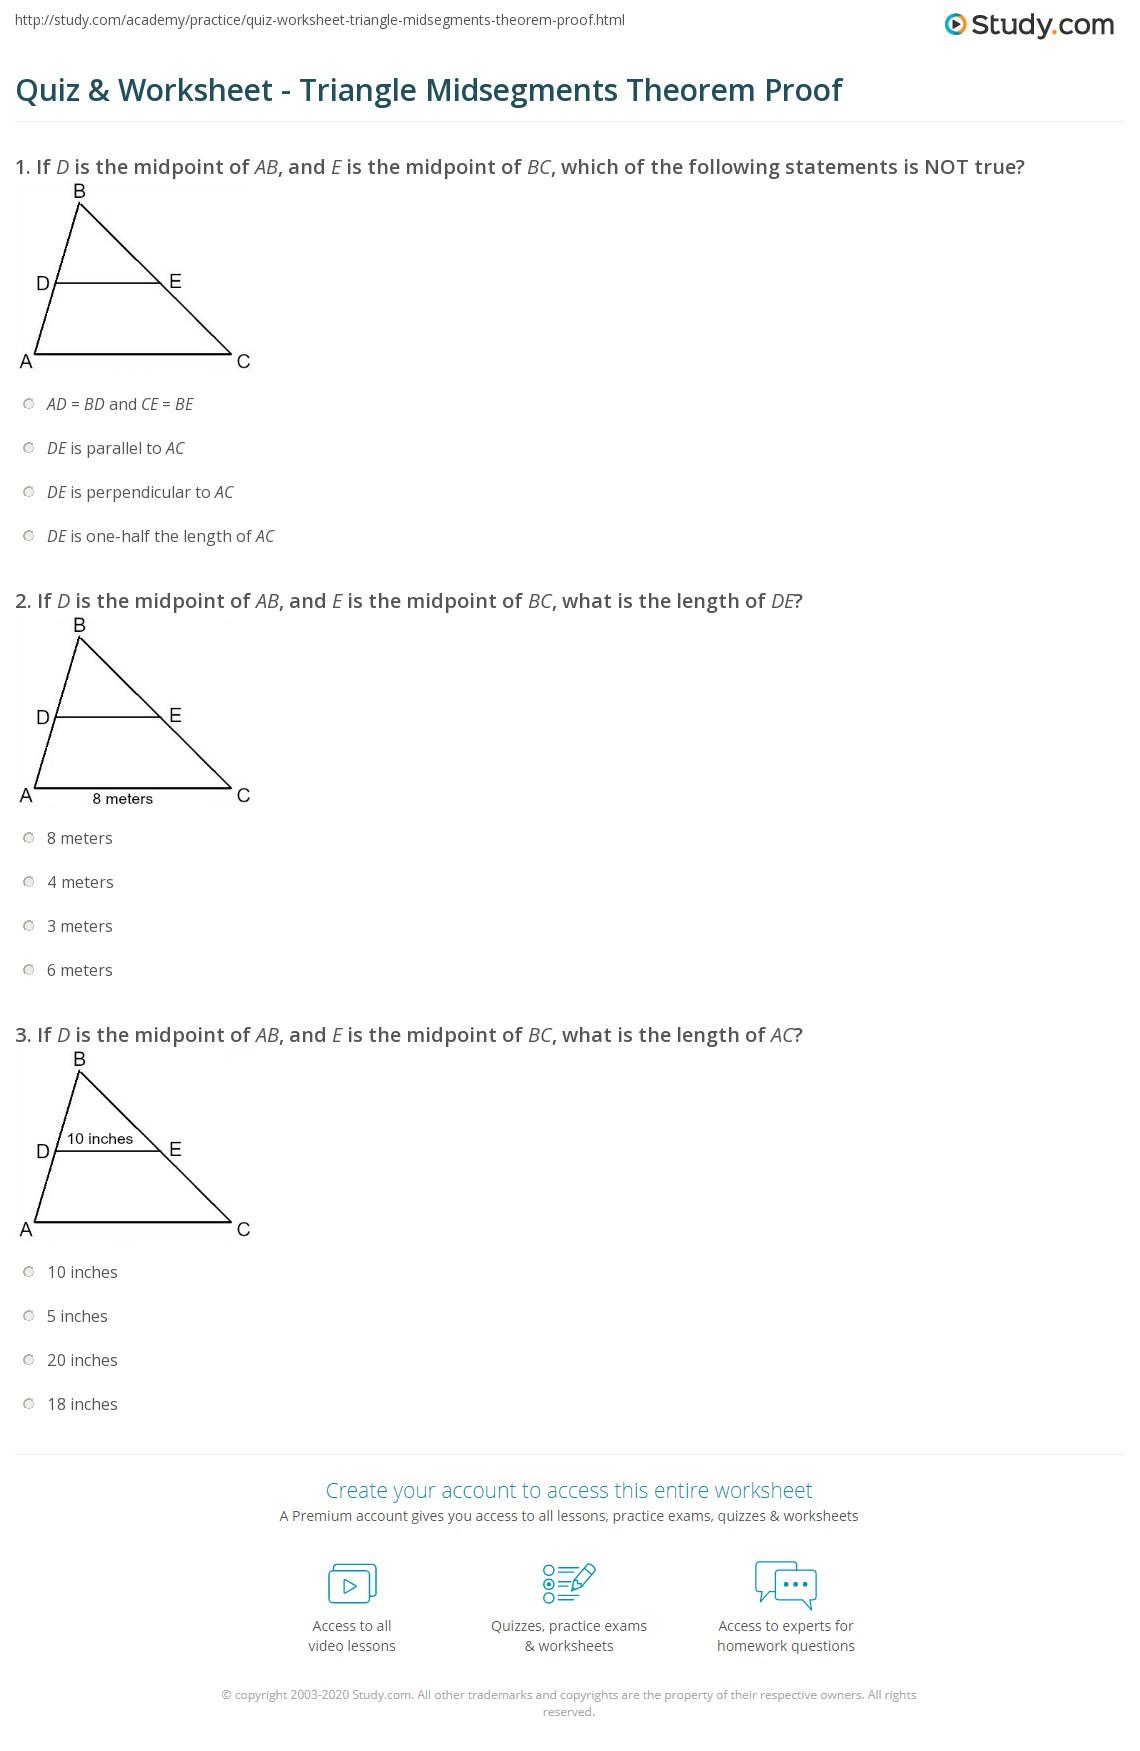 Quiz Worksheet Triangle Midsegments Theorem Proof